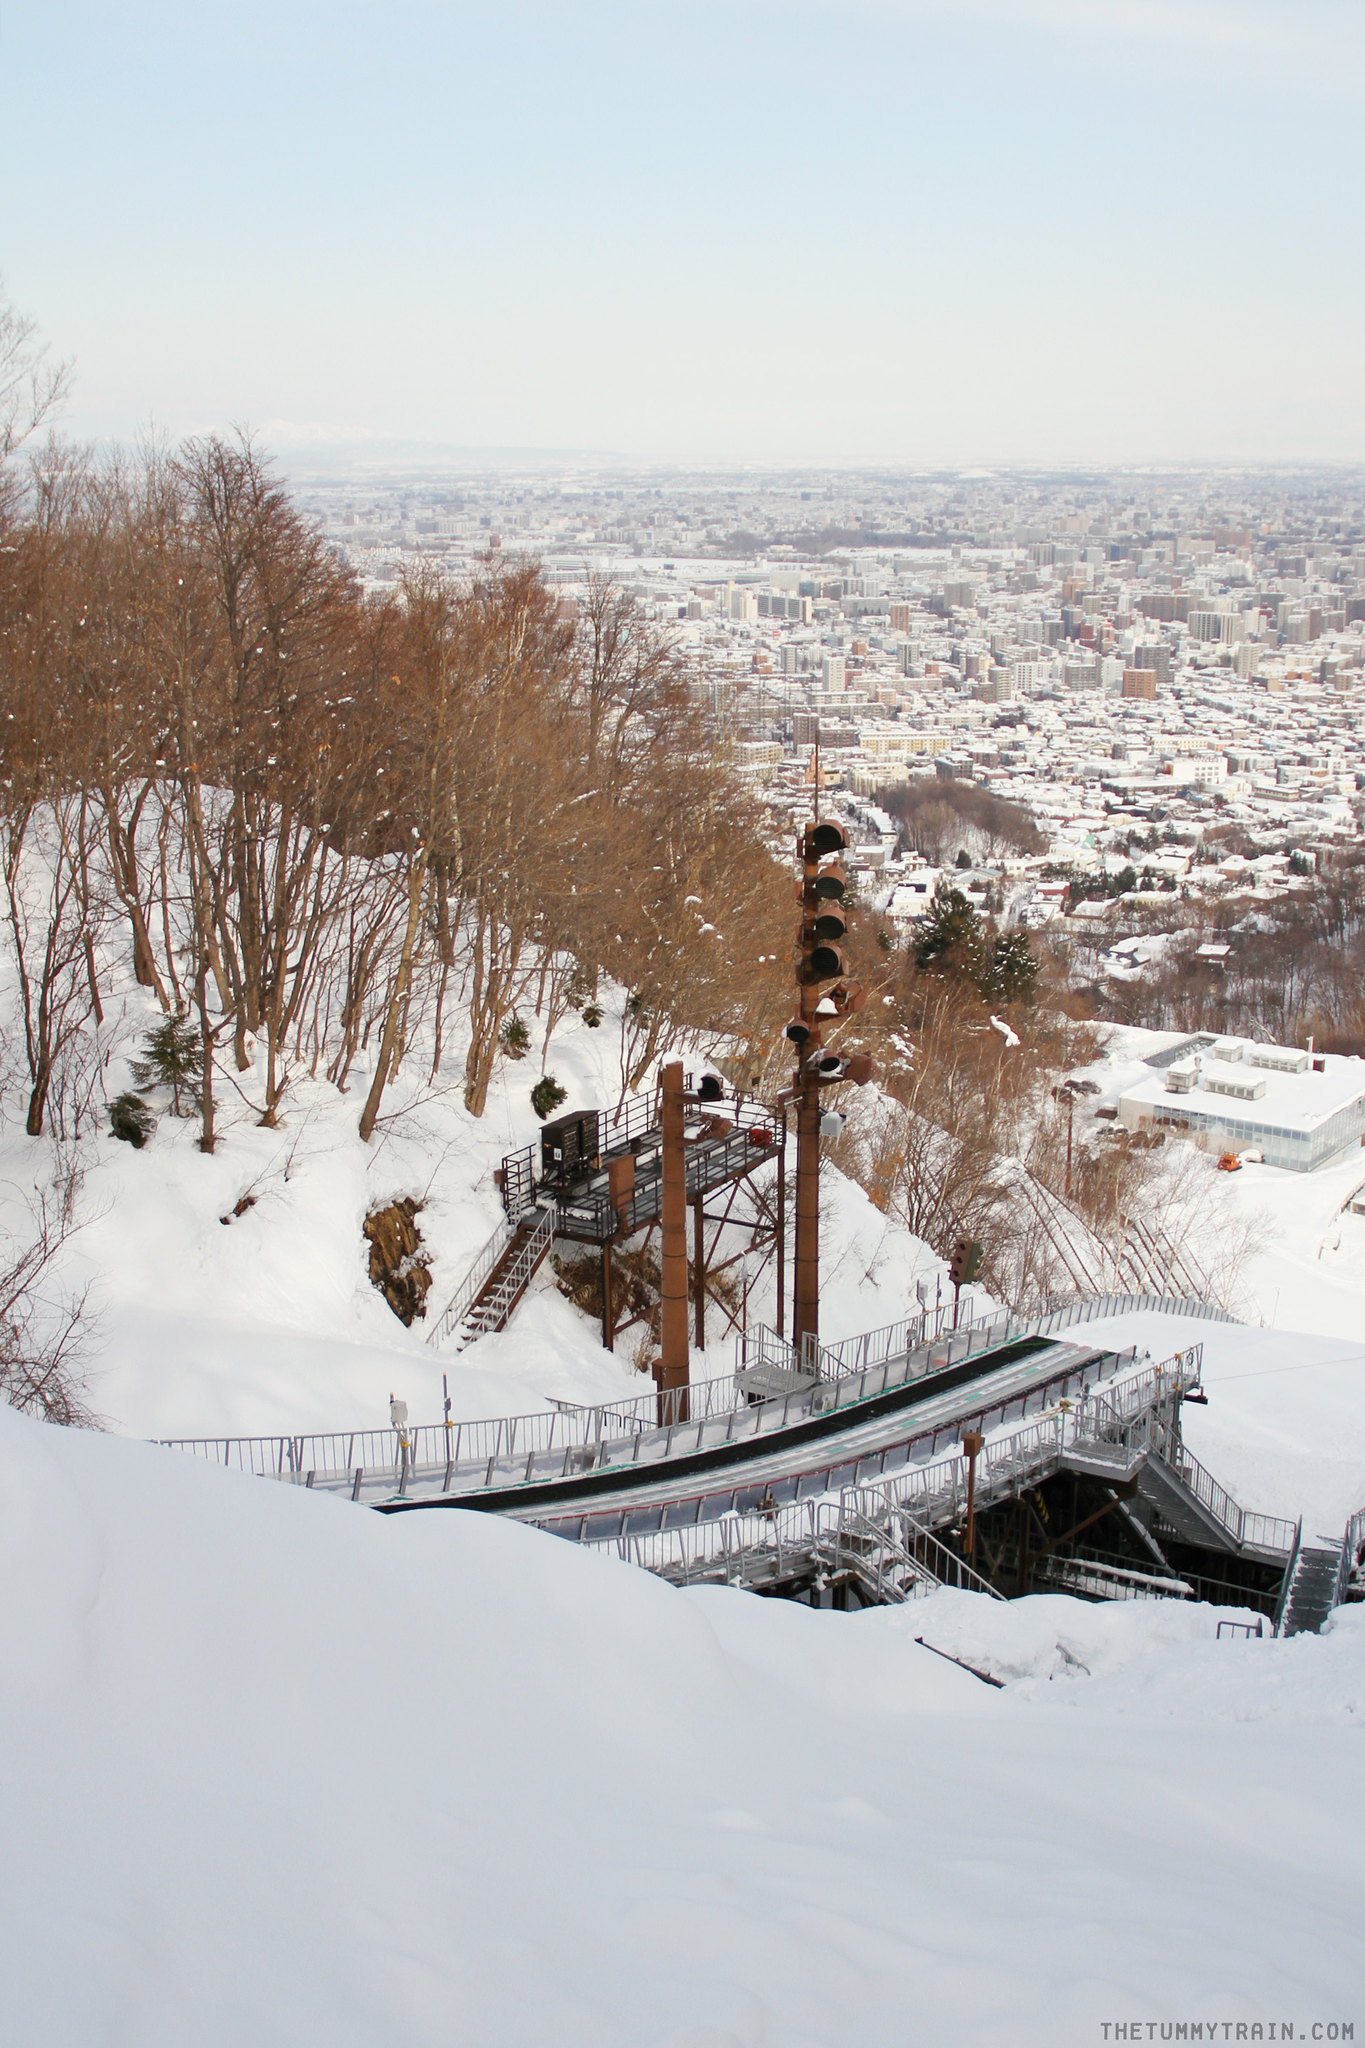 32073894794 fb9db9637a k - Sapporo Travel Diary 2017: Lifting off to the Okurayama Ski Jump Viewing Lounge